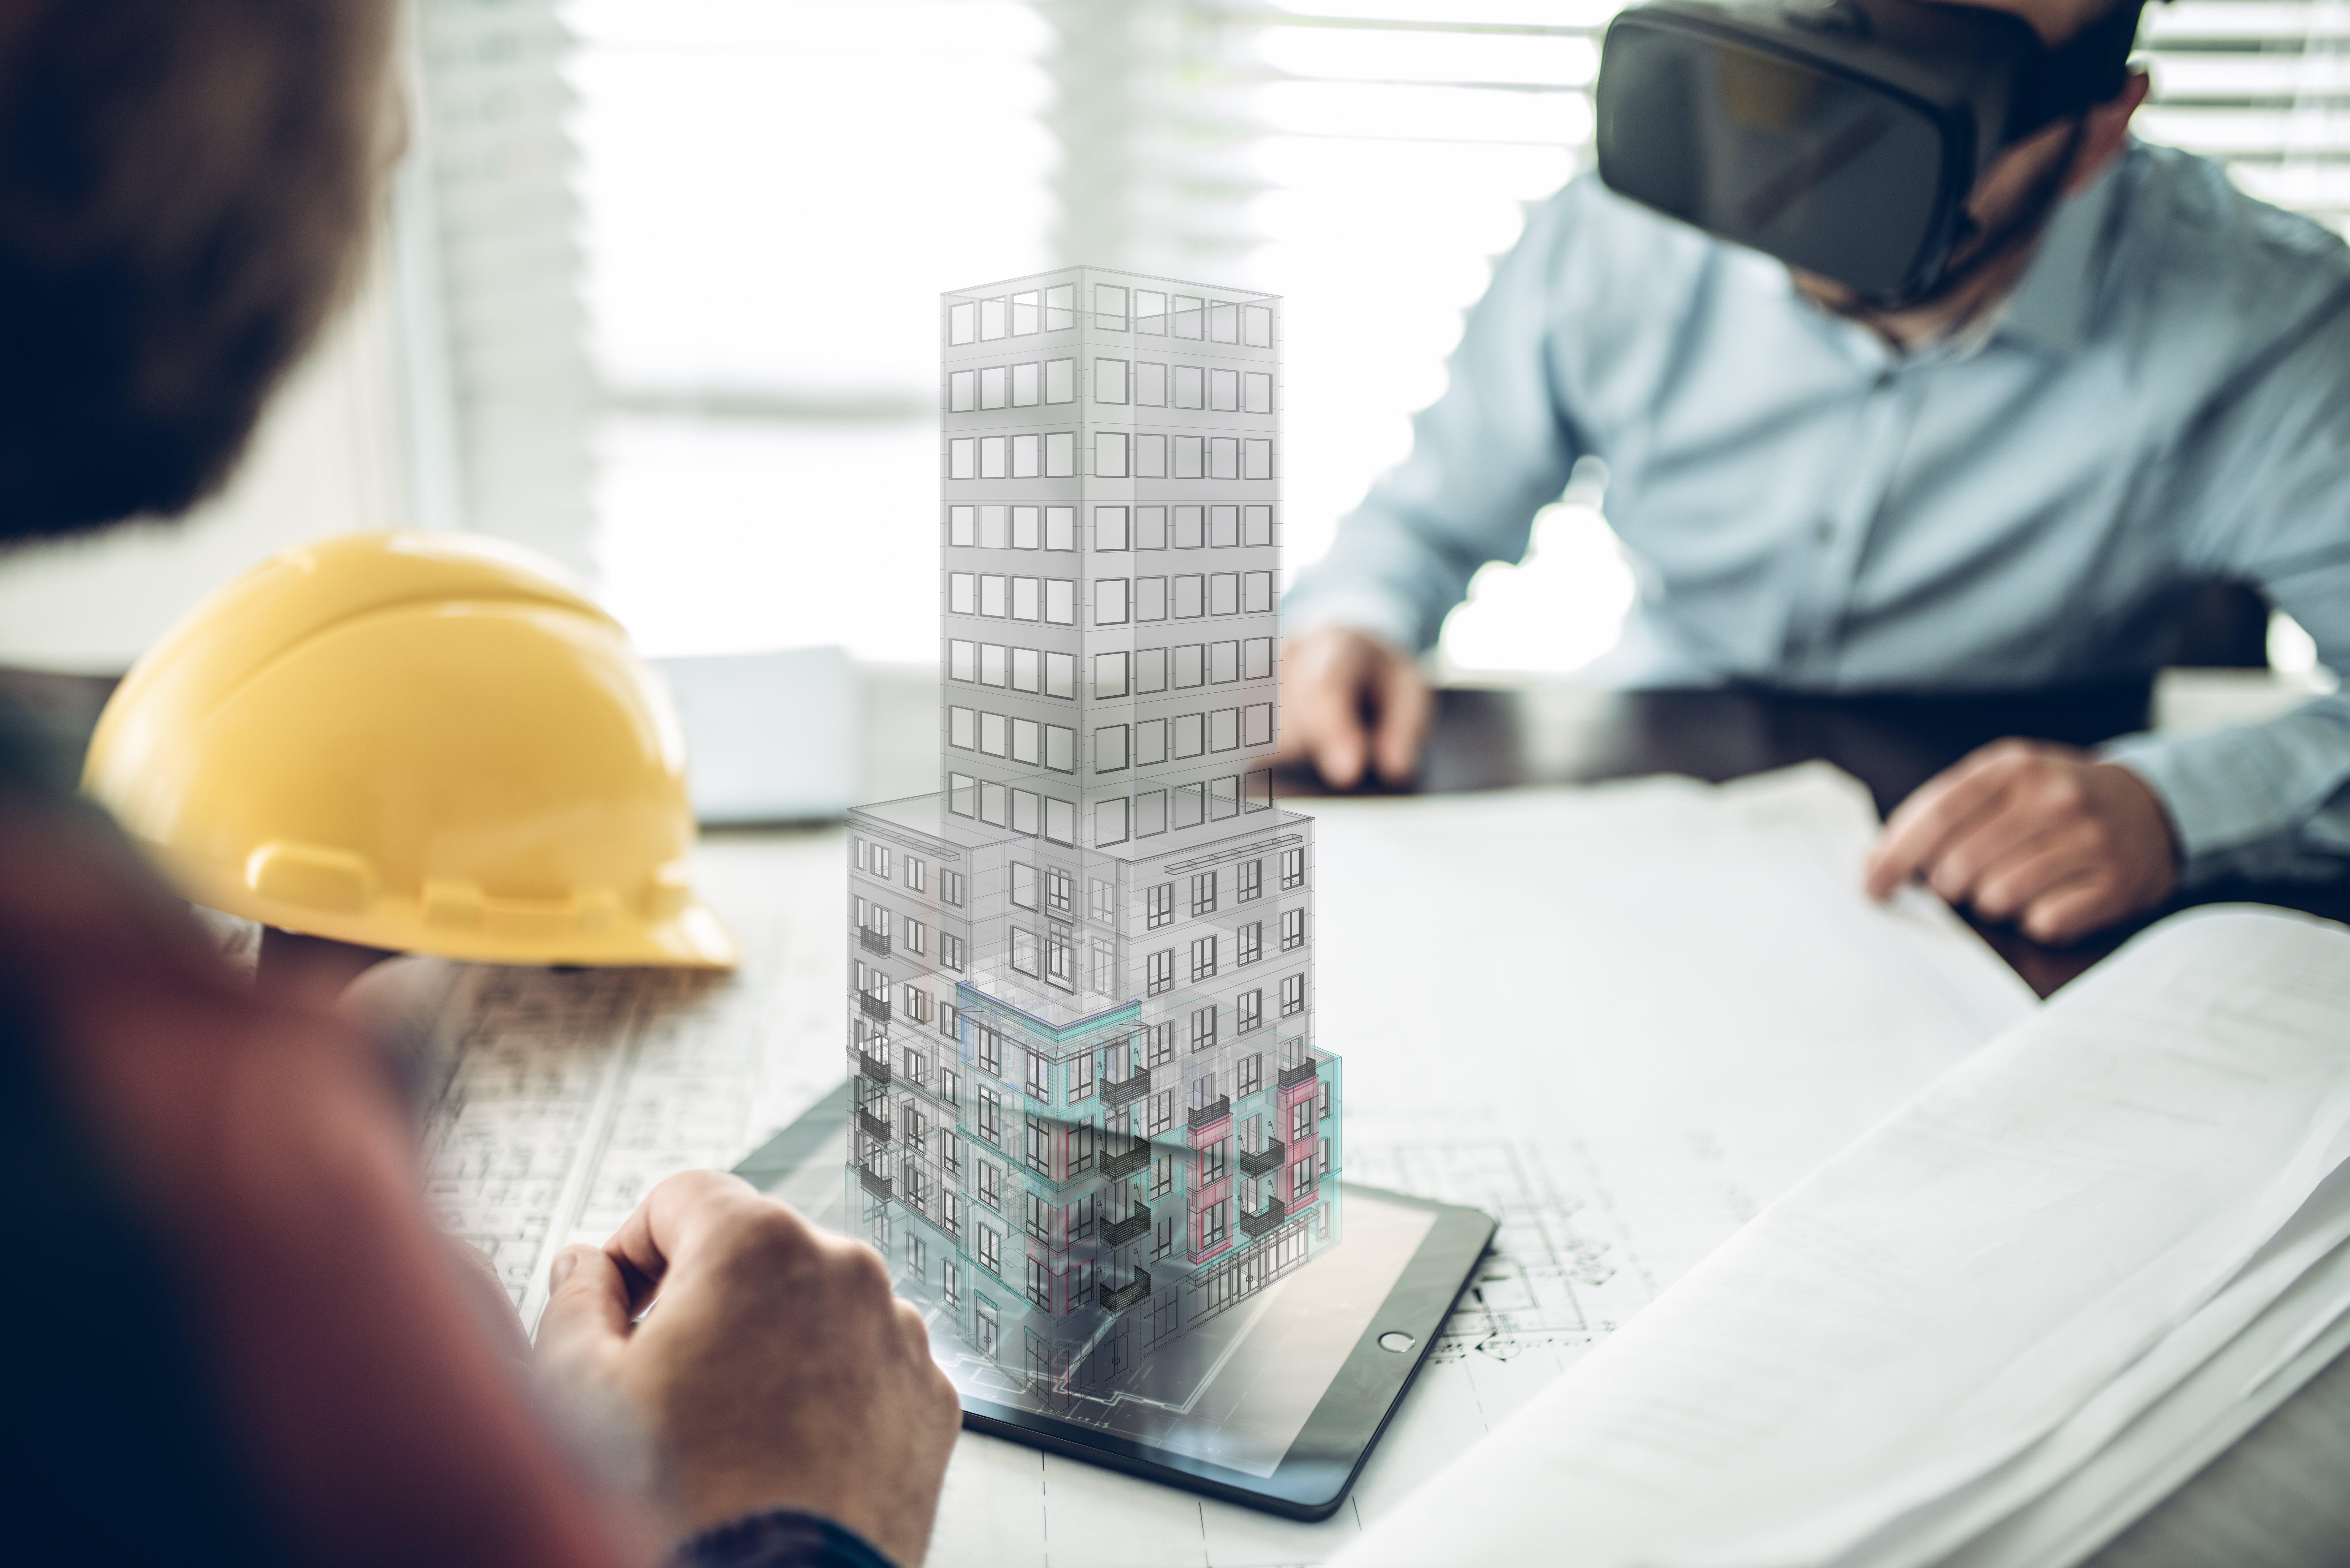 architects-BIM-visualization-of-multi-dimenstional-building